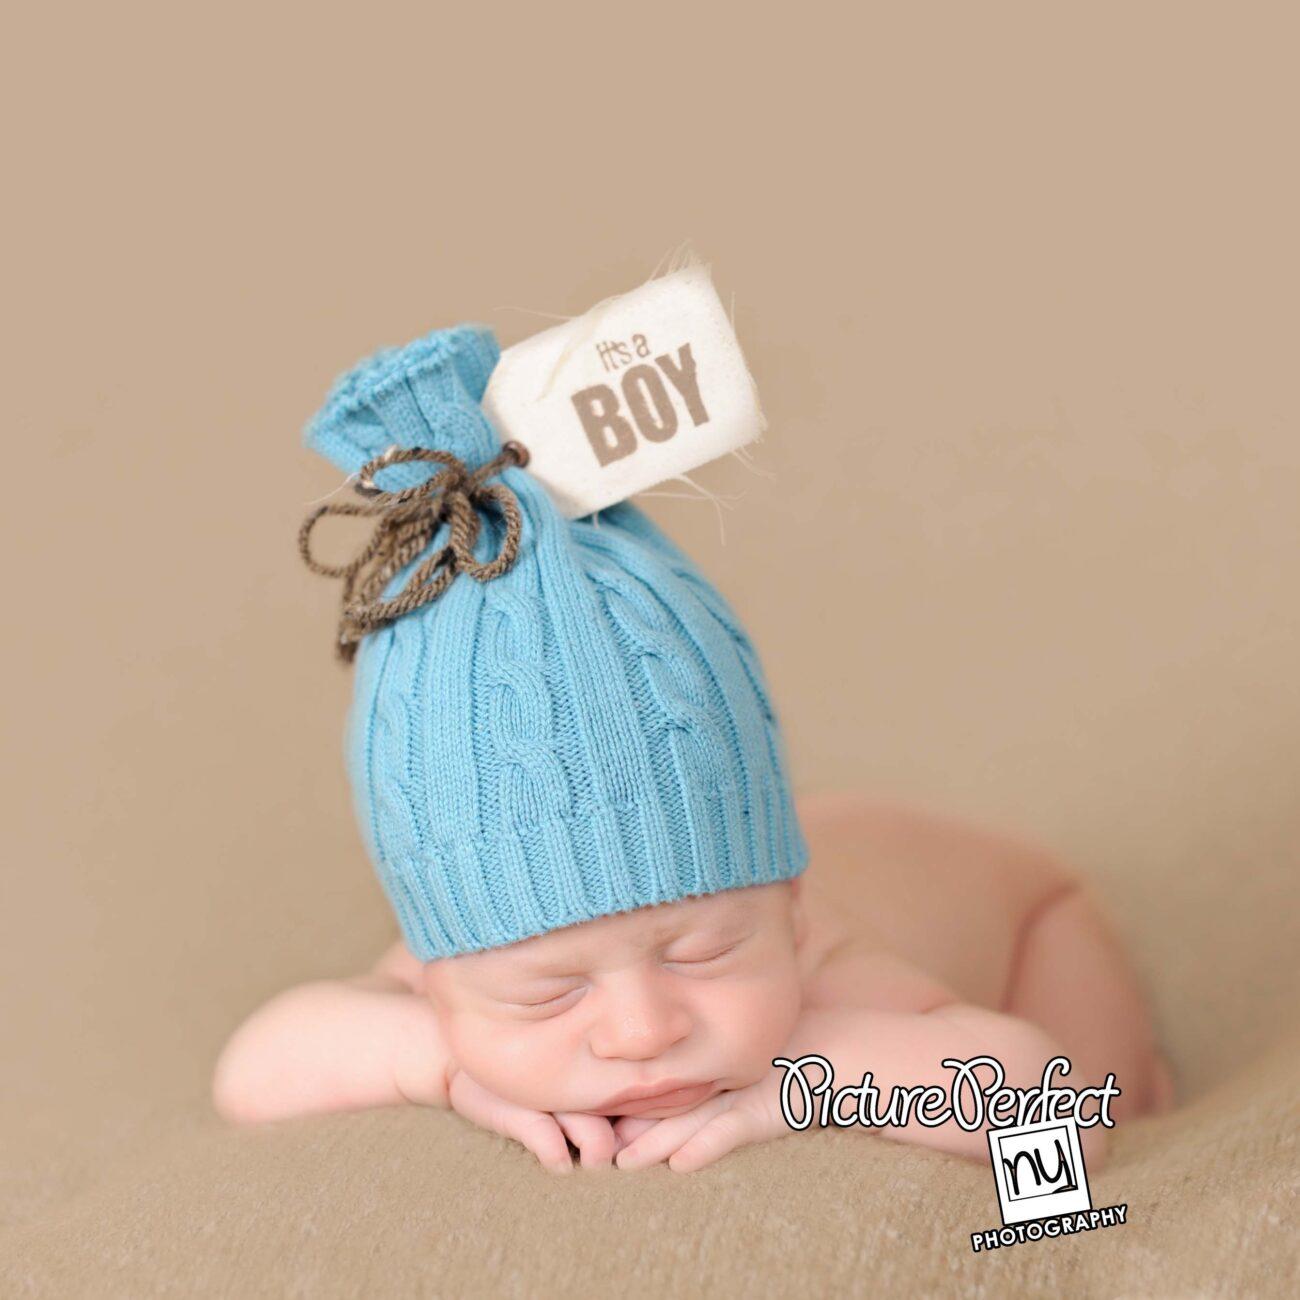 Brooklyn, NY Newborn Photographer